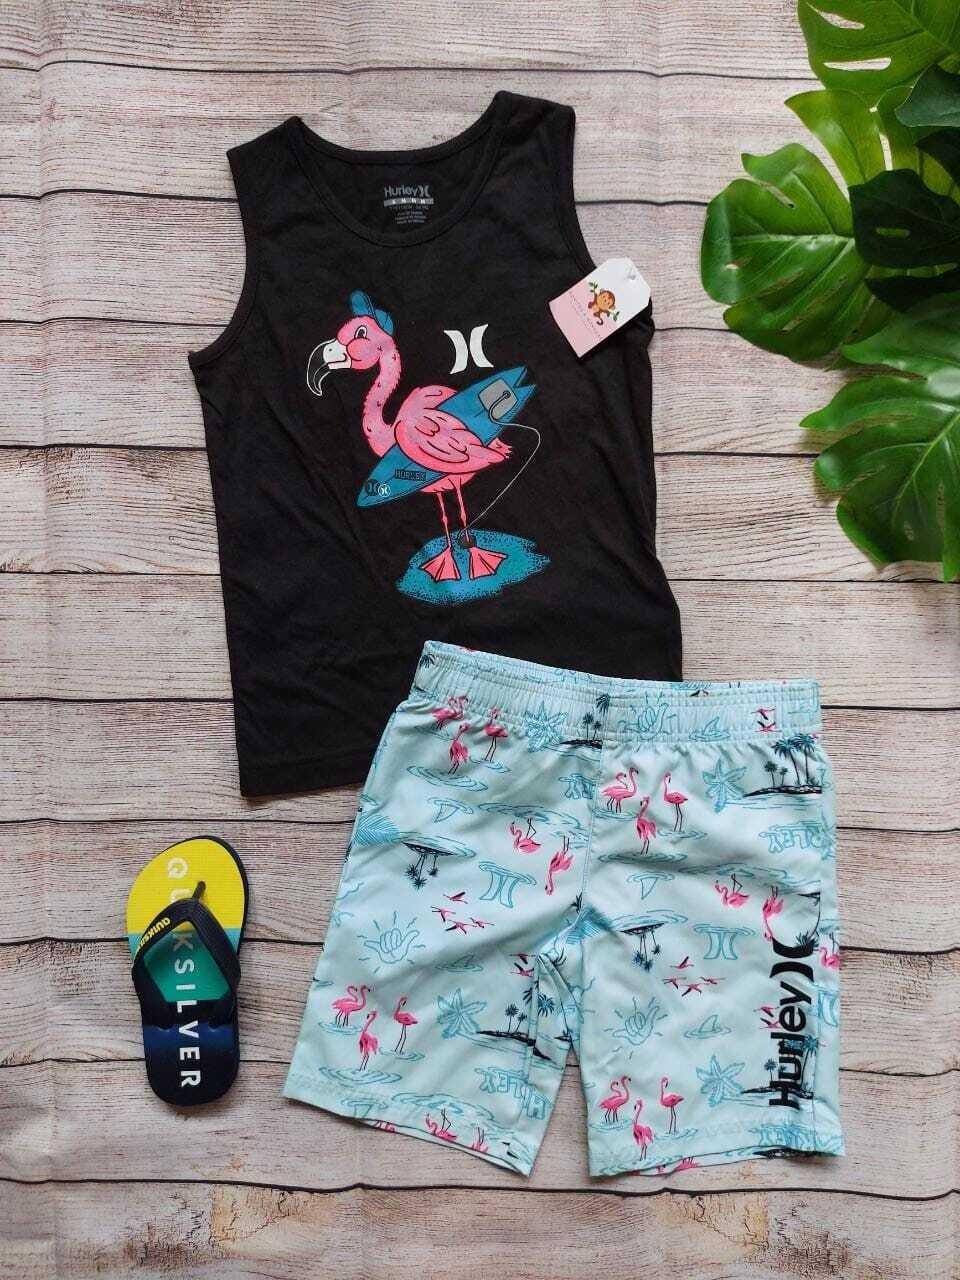 Set Hurley, camiseta bbd negra flamingo + bermuda playera celeste, 5 - 6 años